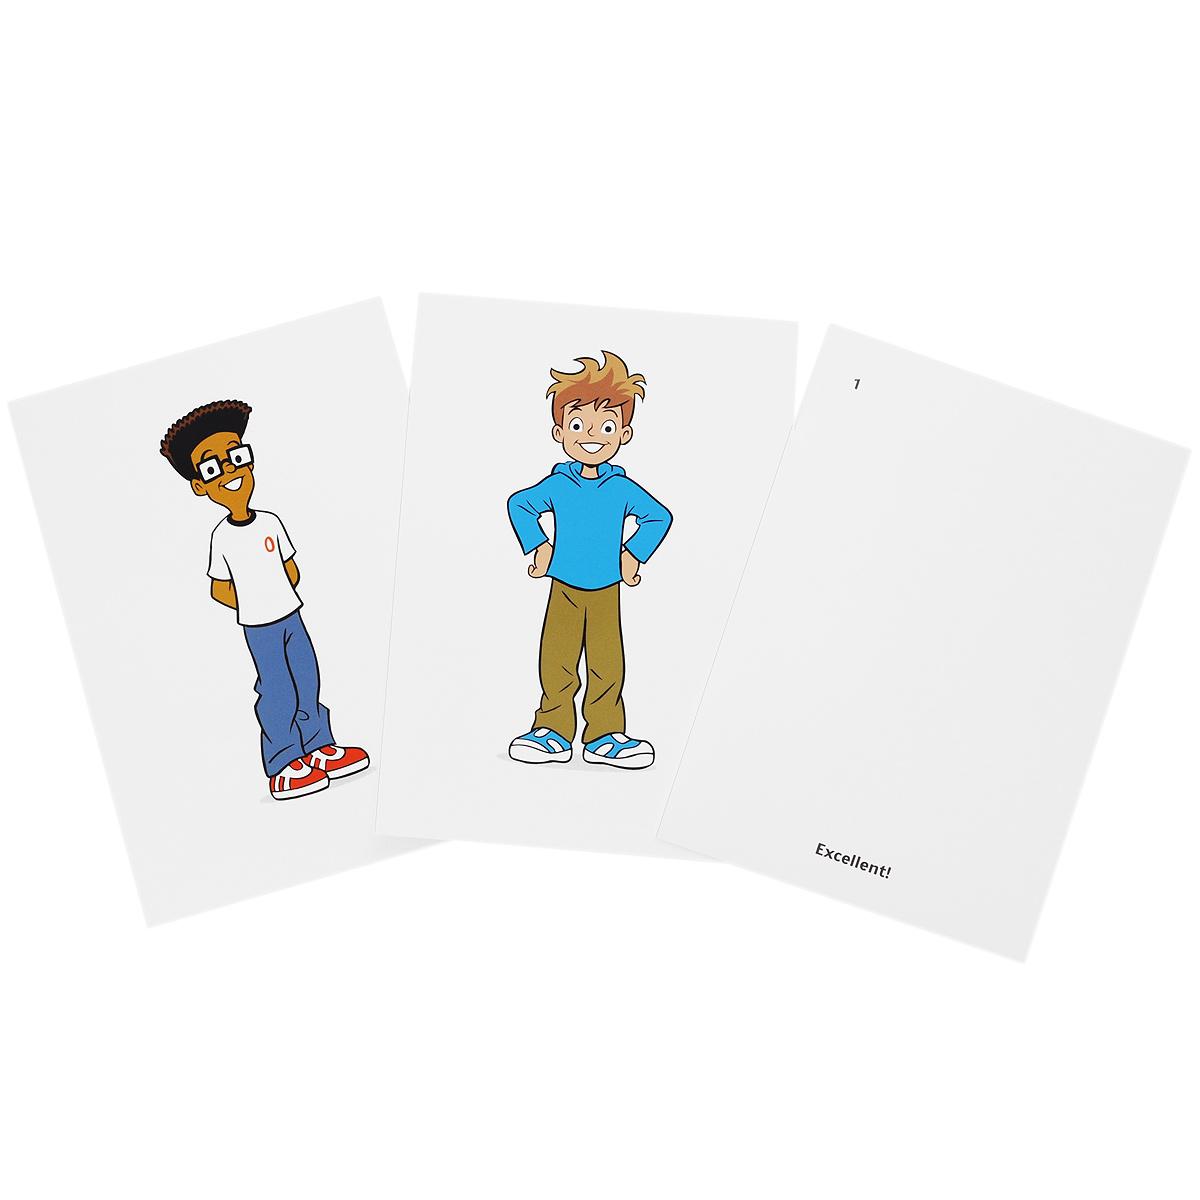 Excellent 1, 2: Flashcards